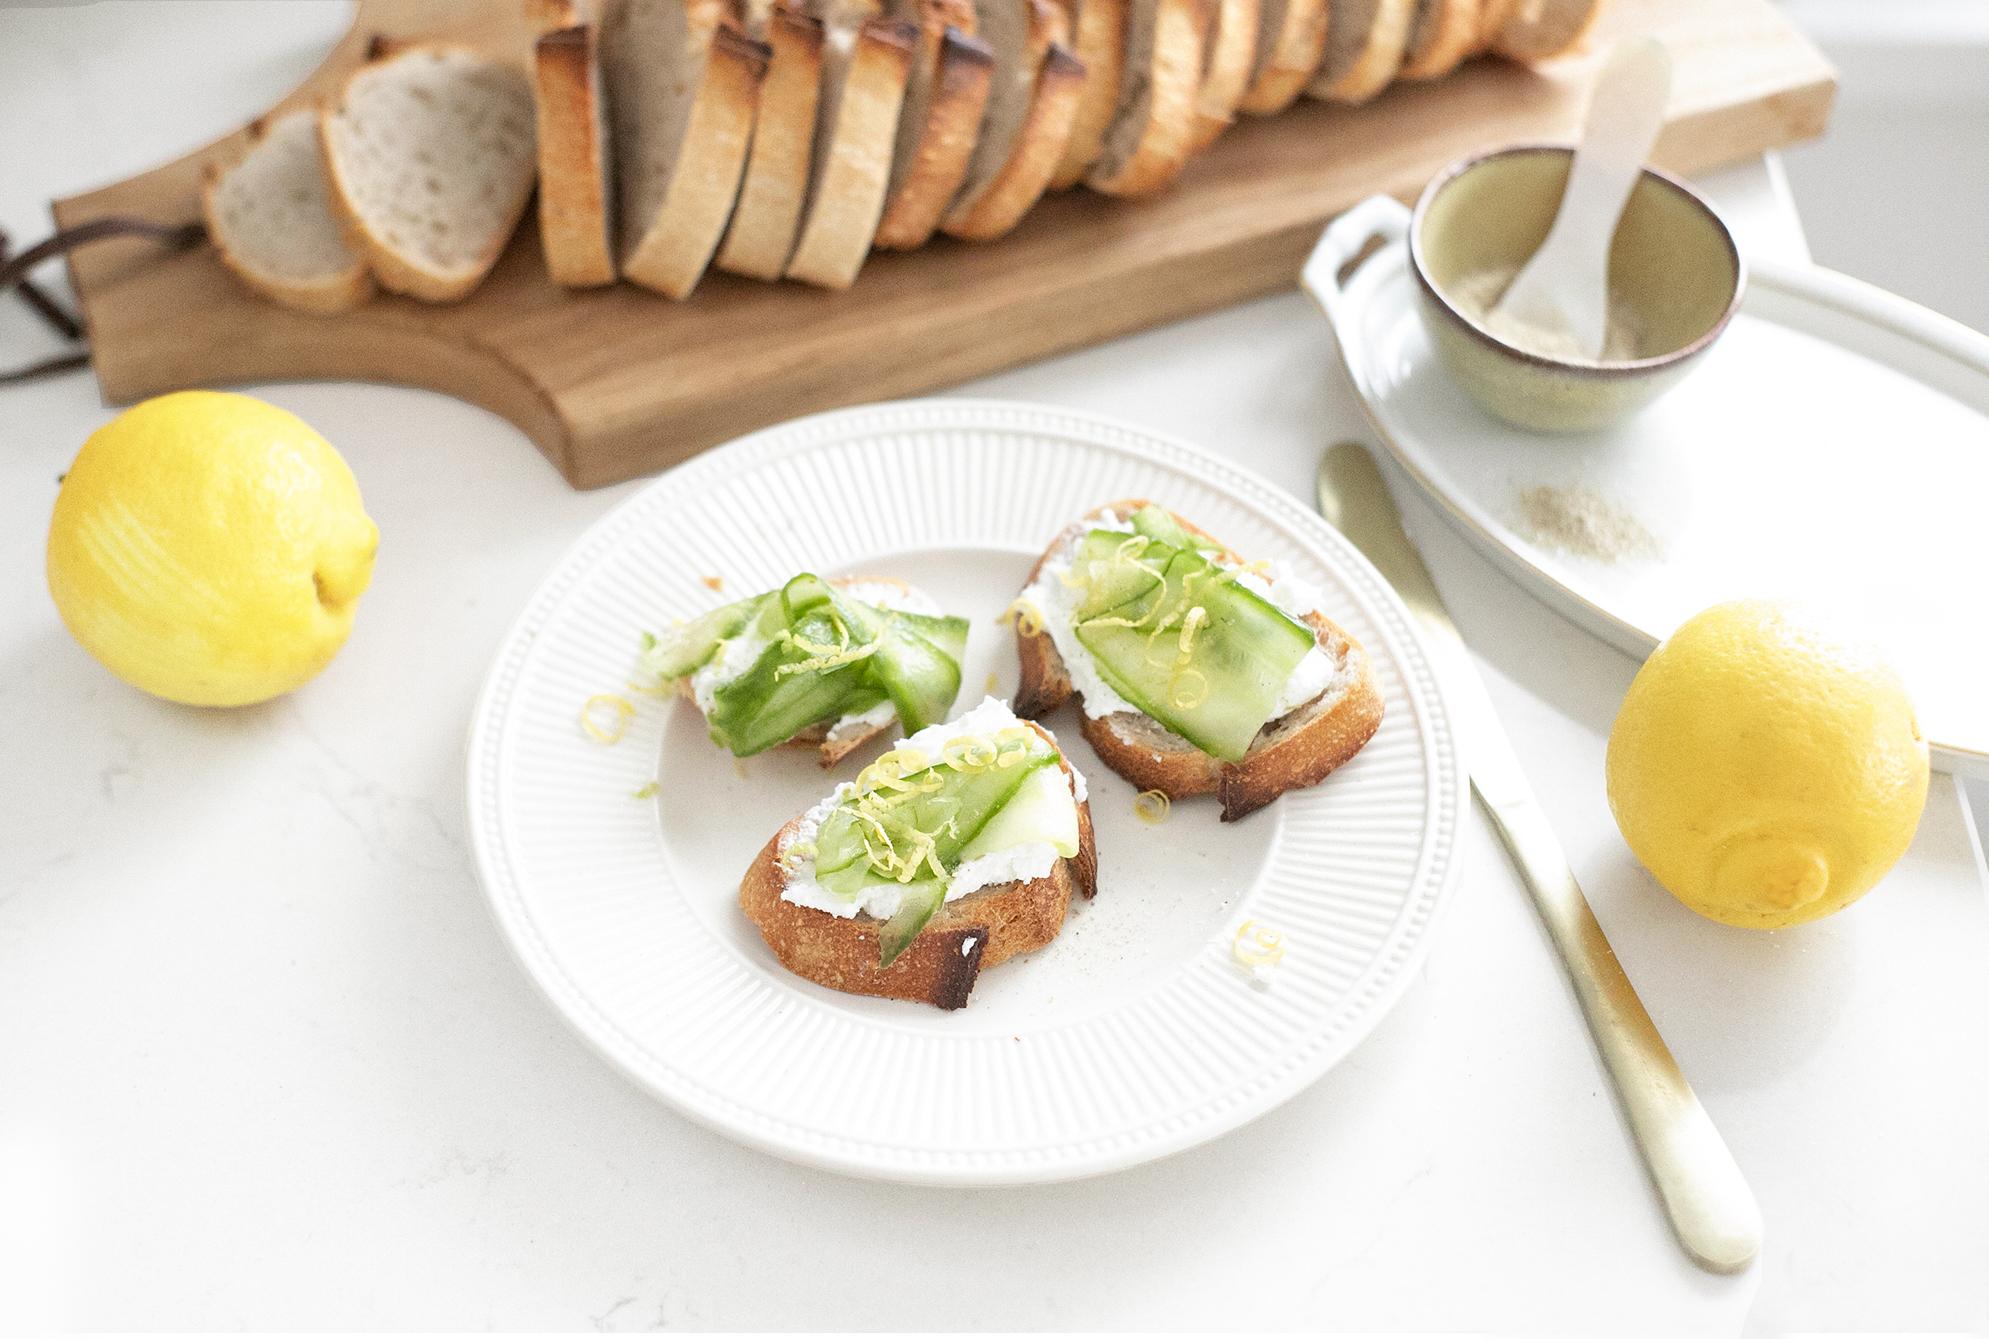 Desem toast met geitenkaas en frisse komkommer